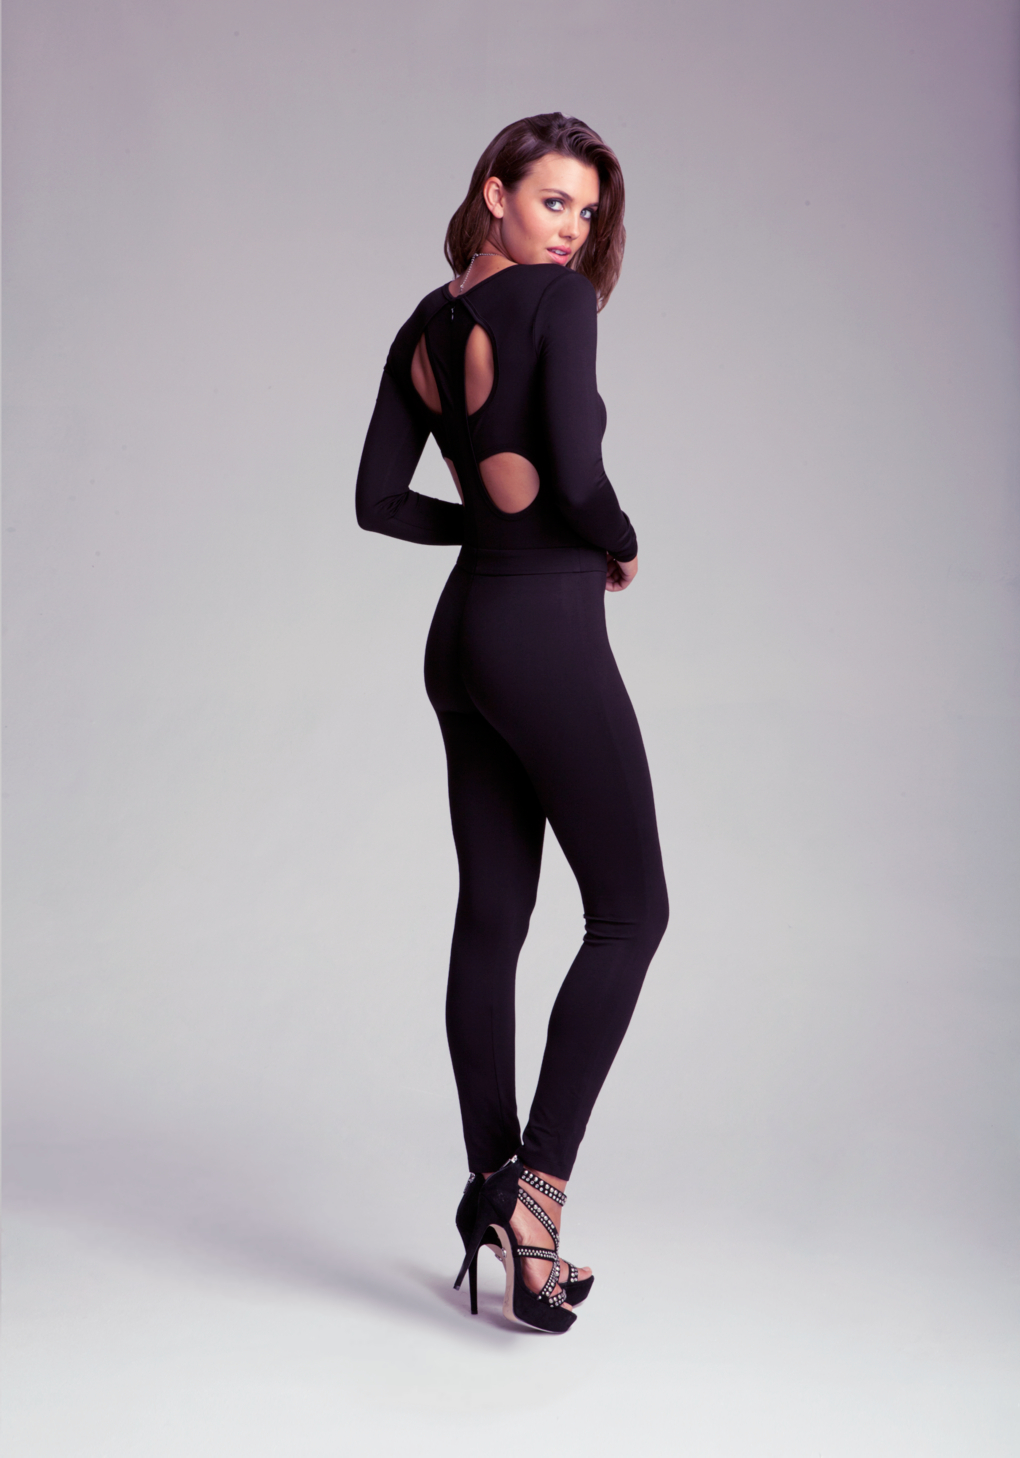 0fe84e94f499 Lyst - Bebe Cloverleaf Cut Out Jumpsuit in Black